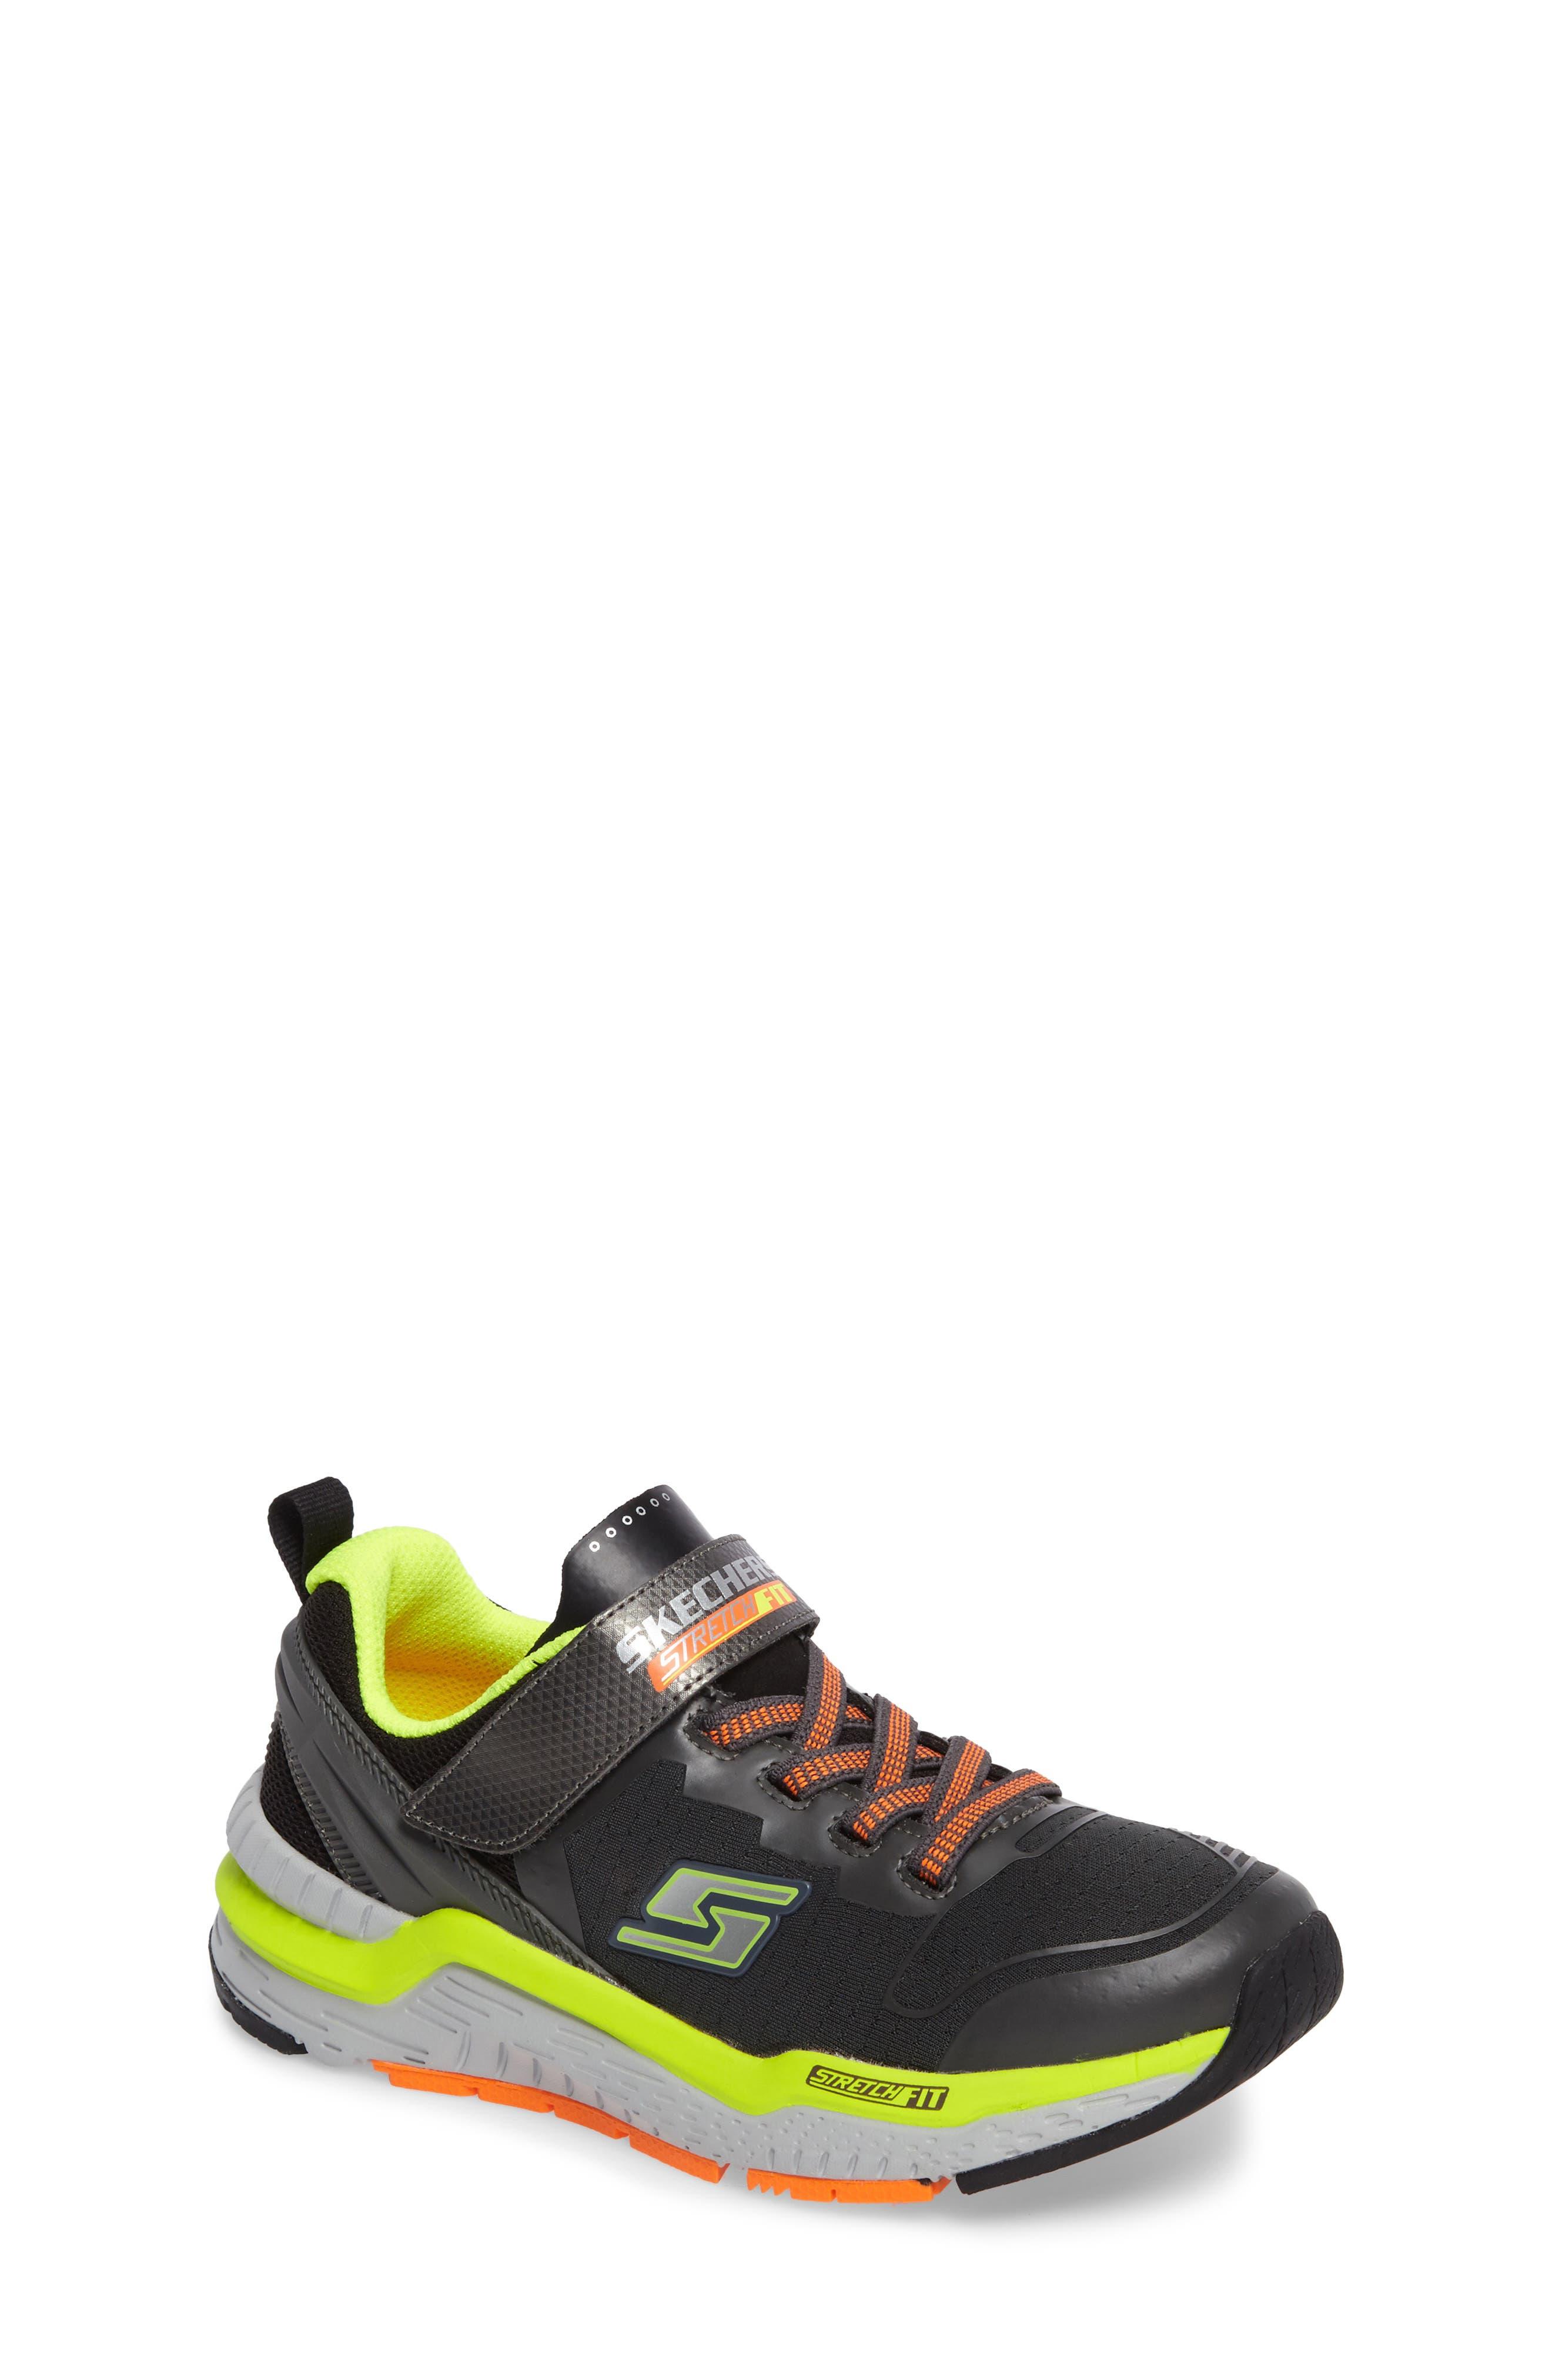 Hyperjolt Sneaker,                             Main thumbnail 1, color,                             Charcoal/ Black/ Lime